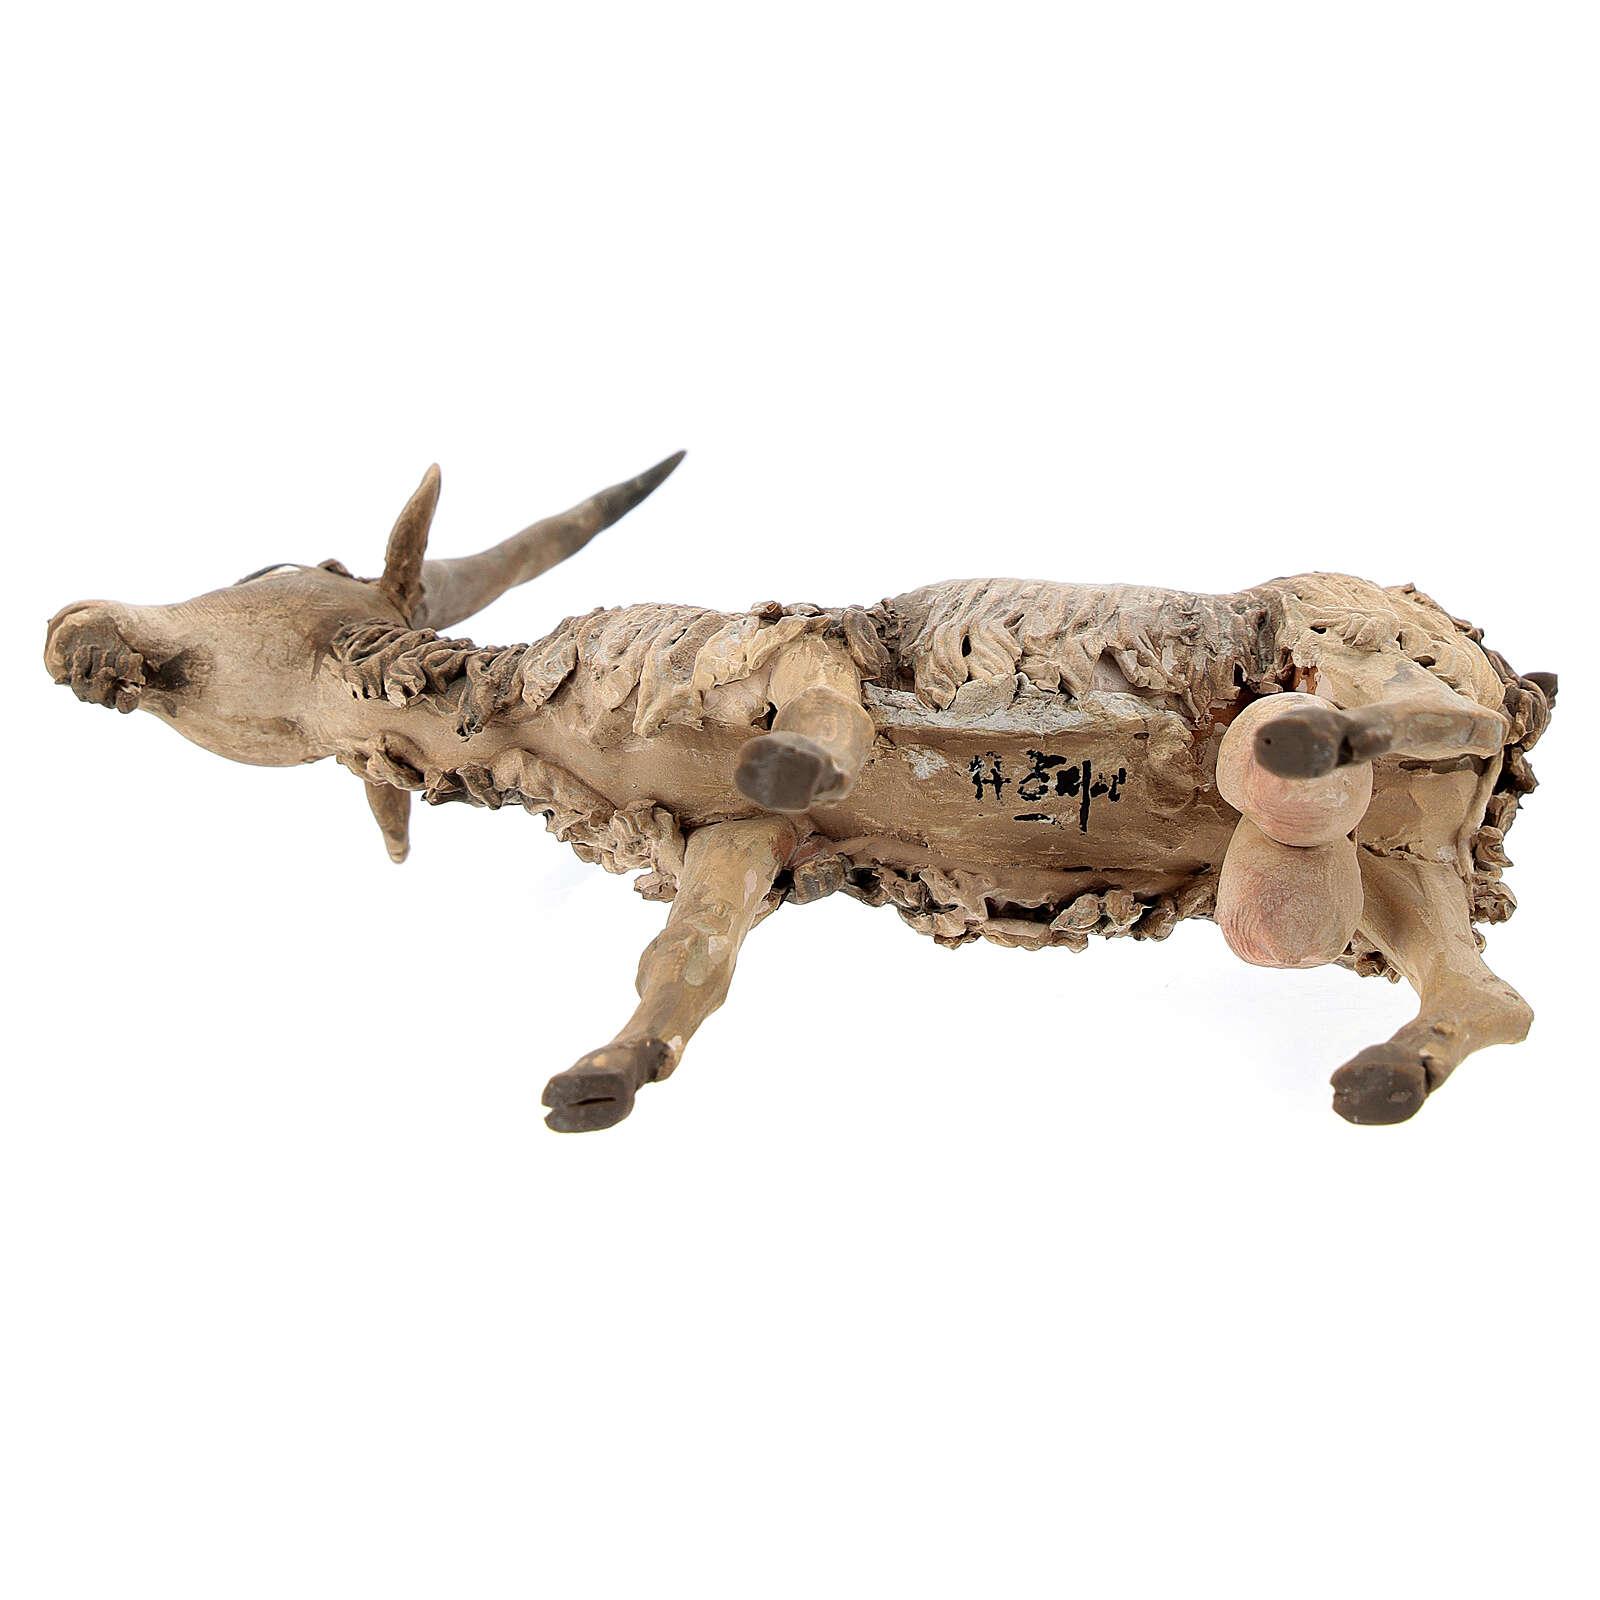 Cabra cabeza baja Belén 18 cm Angela Tripi terracota 4